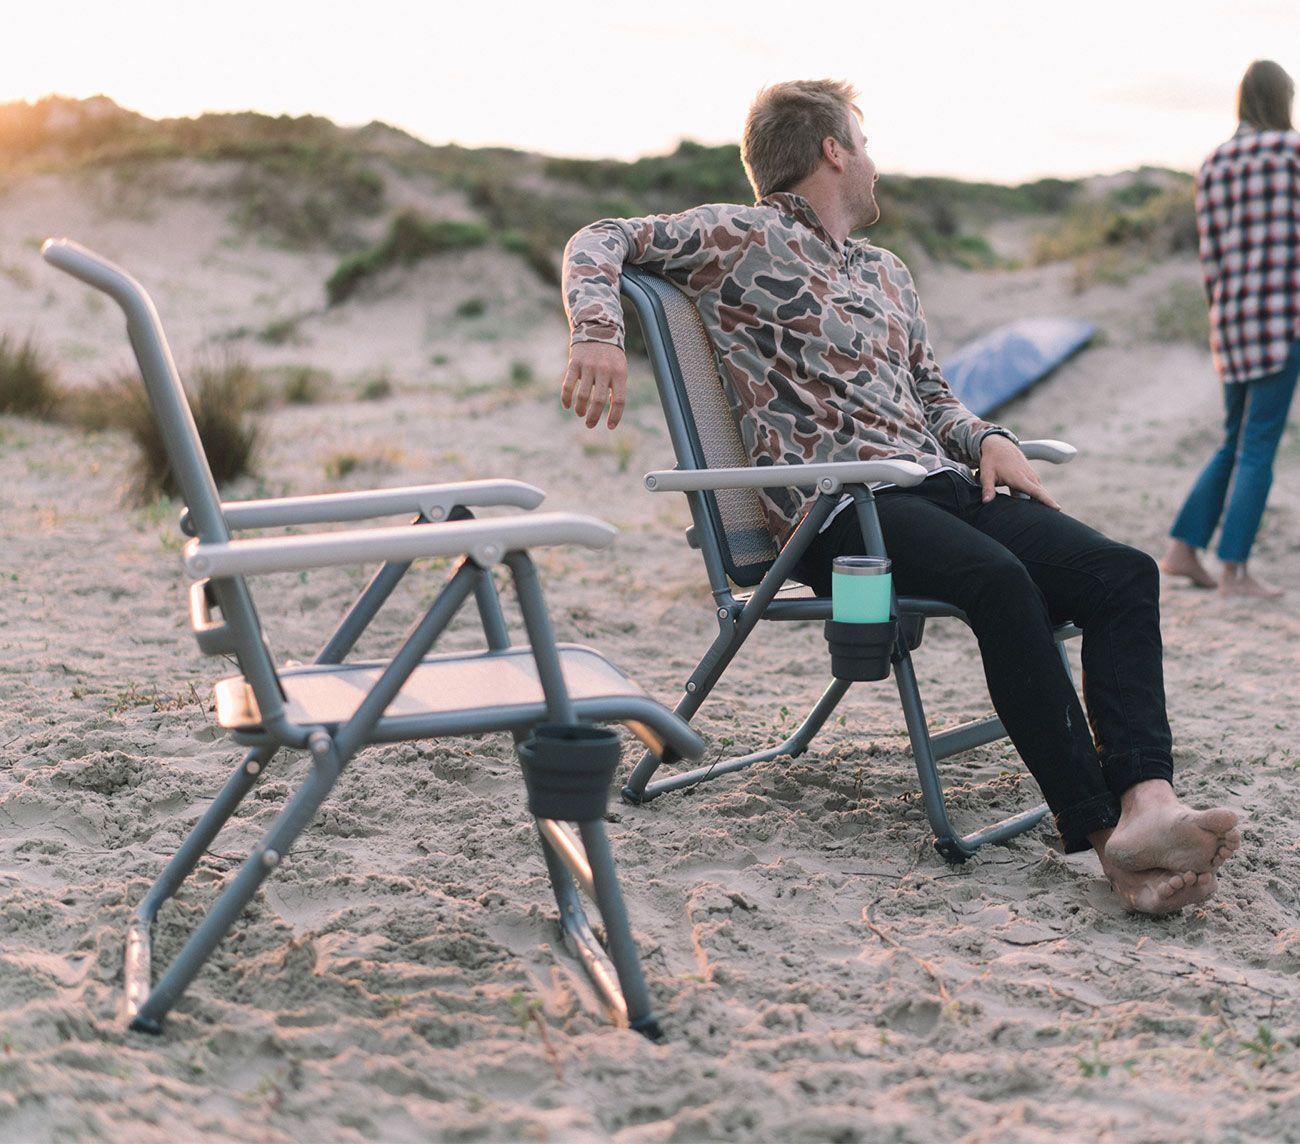 Hondo base camp chair camping chairs eames rocking